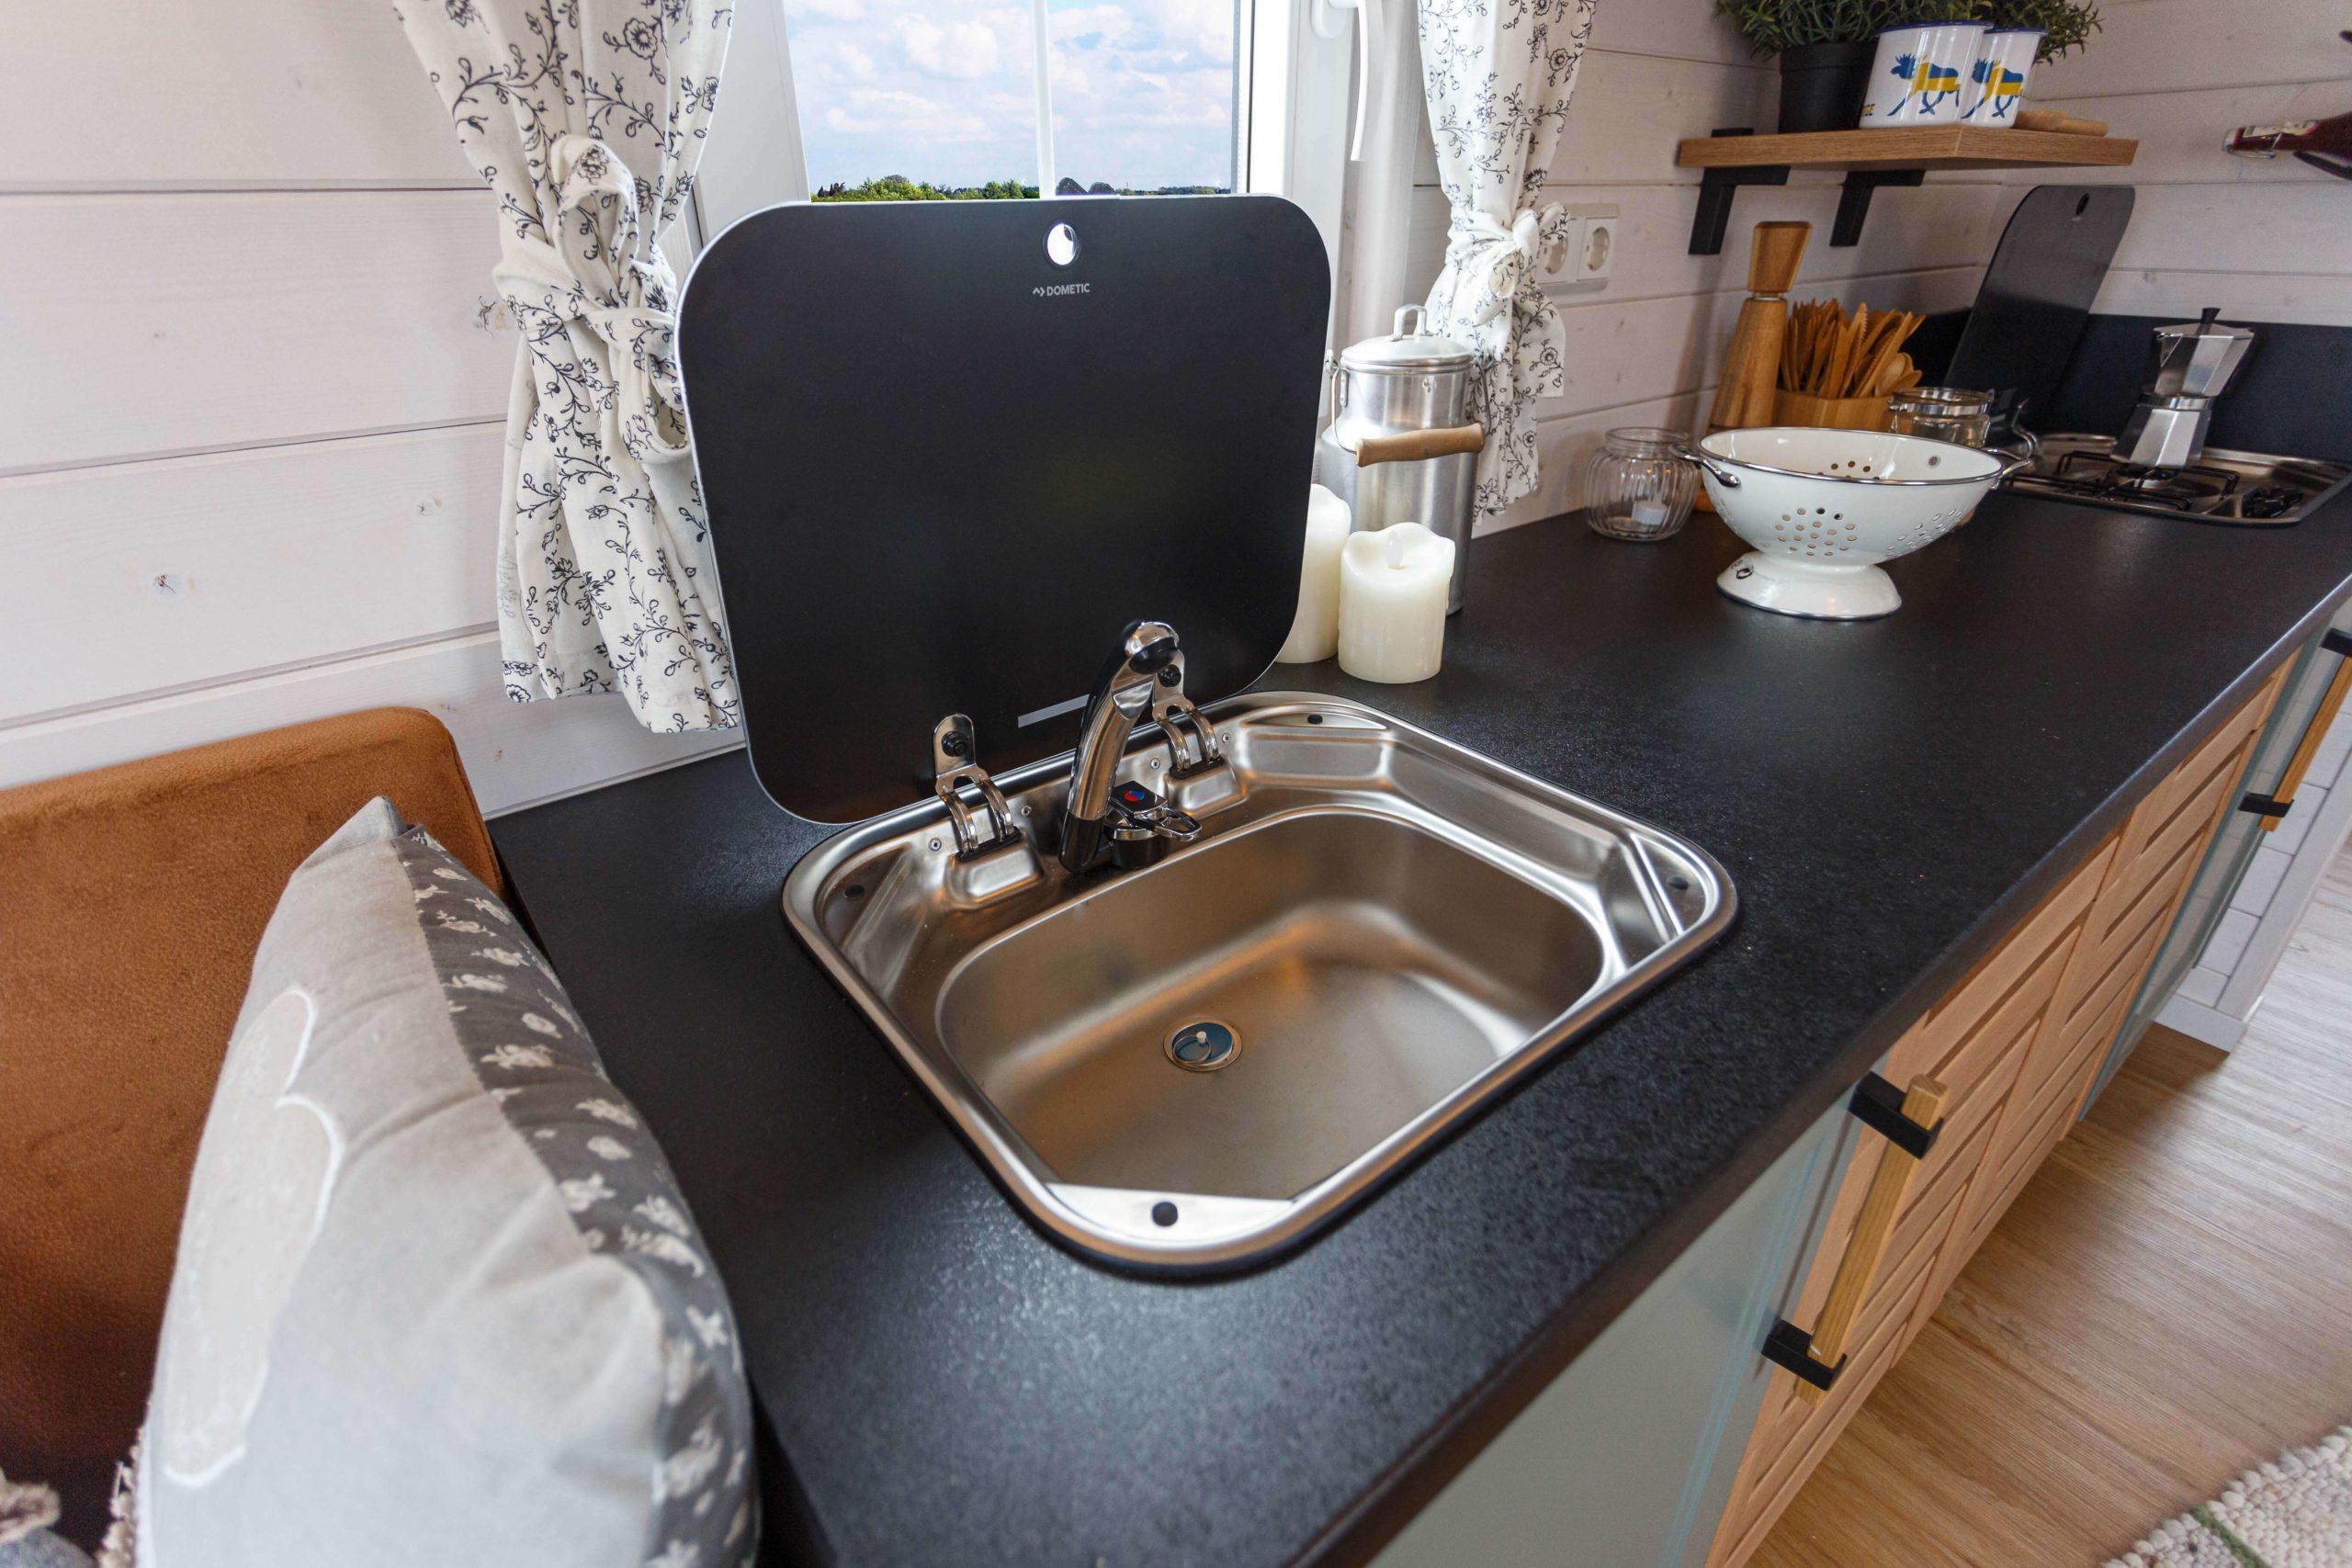 mobiles-tiny-house-schweden-vital-camp-gmbh-30